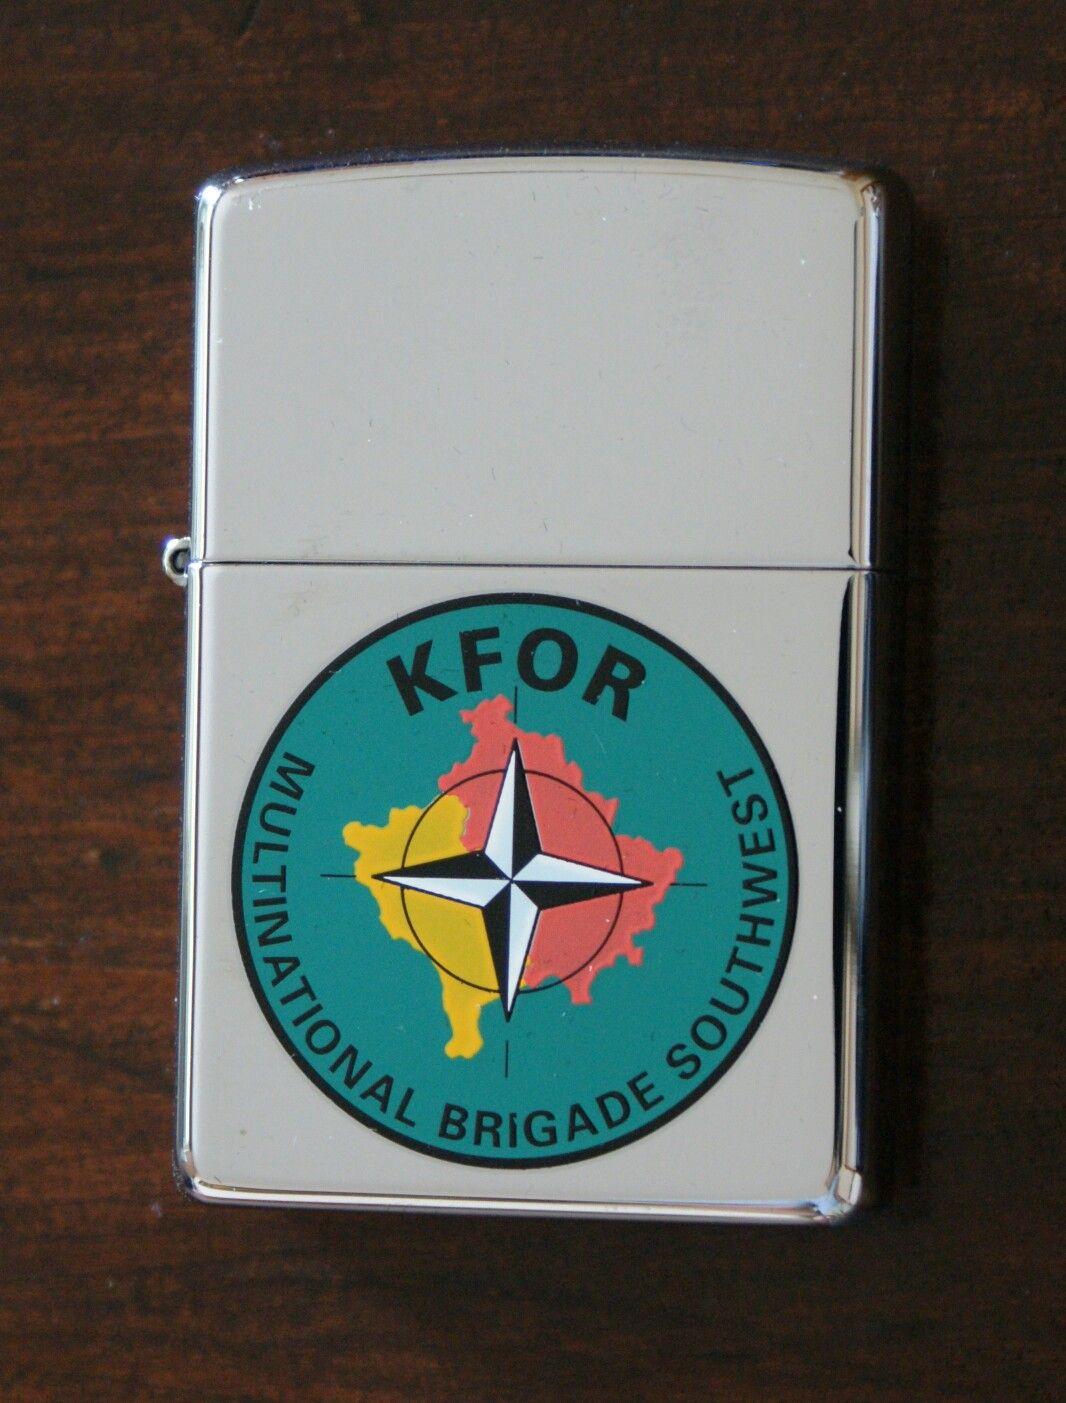 Zippo Kfor Multinatiol Brigade Southwest Zippo Zippo Limited Edition Zippo Lighter